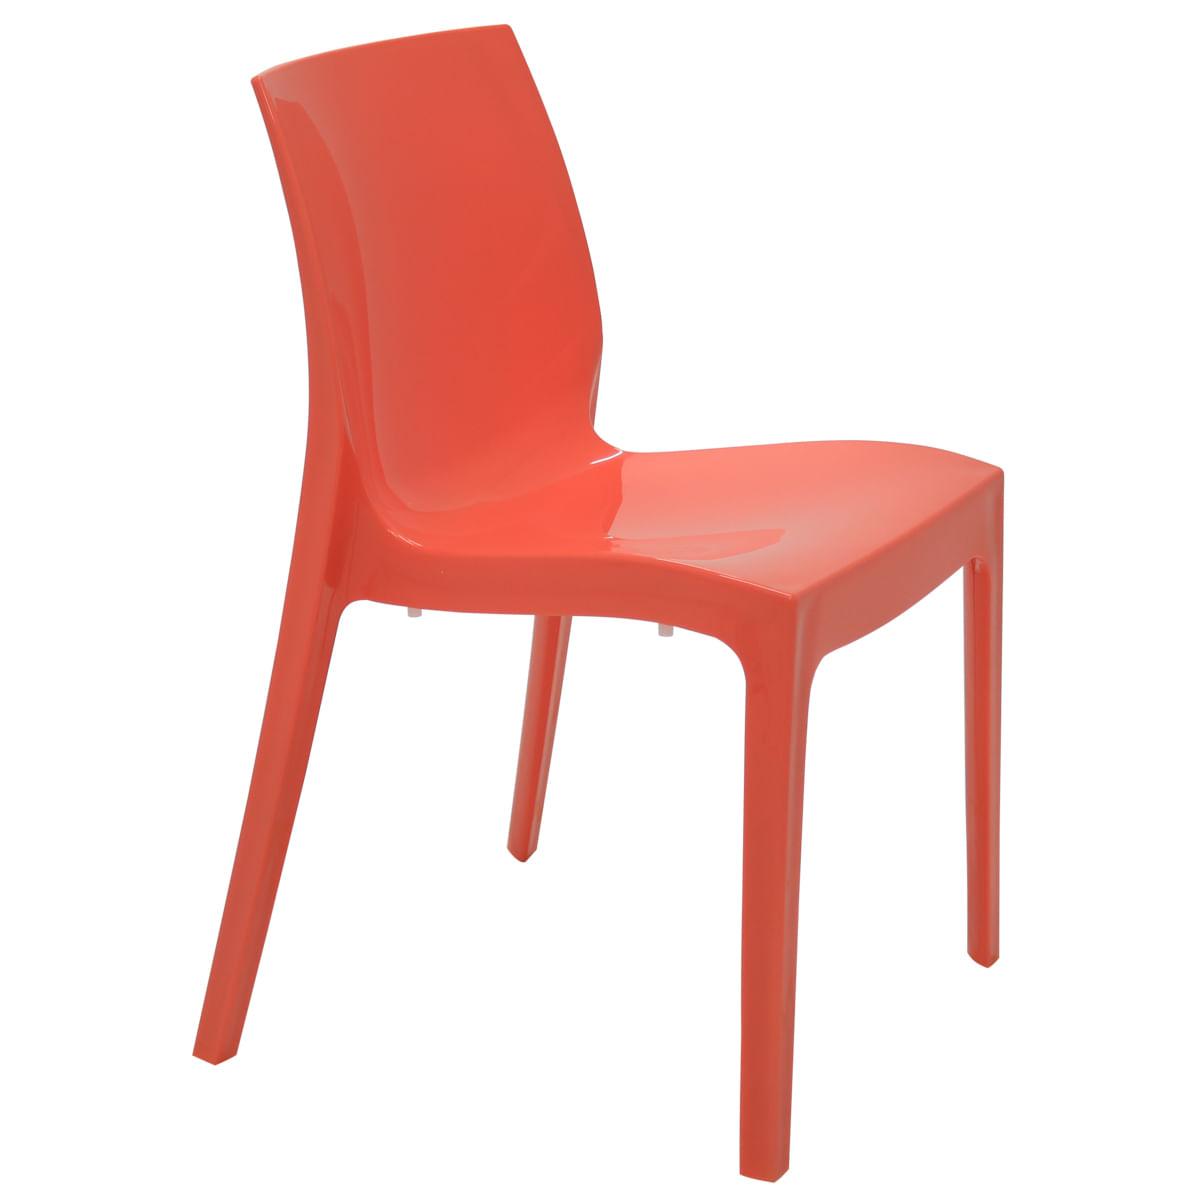 Cadeira Tramontina Alice Polida em Polipropileno Rosa Coral